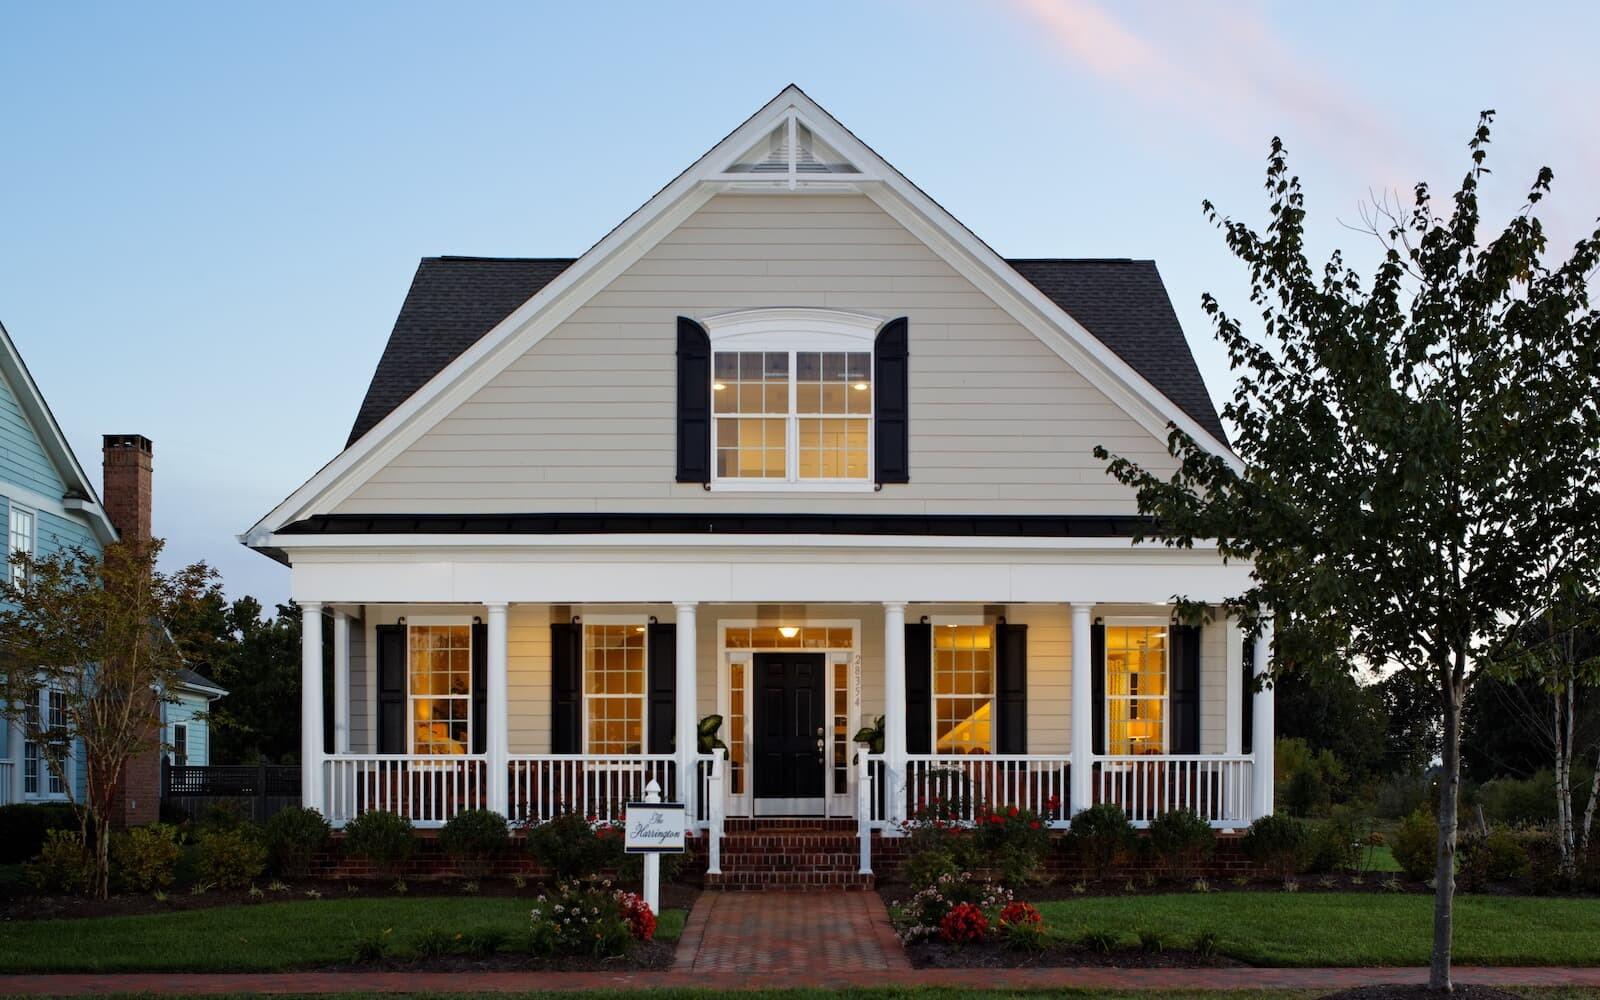 Harrington-front-exterior-single-family-home-easton-md-easton-village-brookfield-residential.jpg